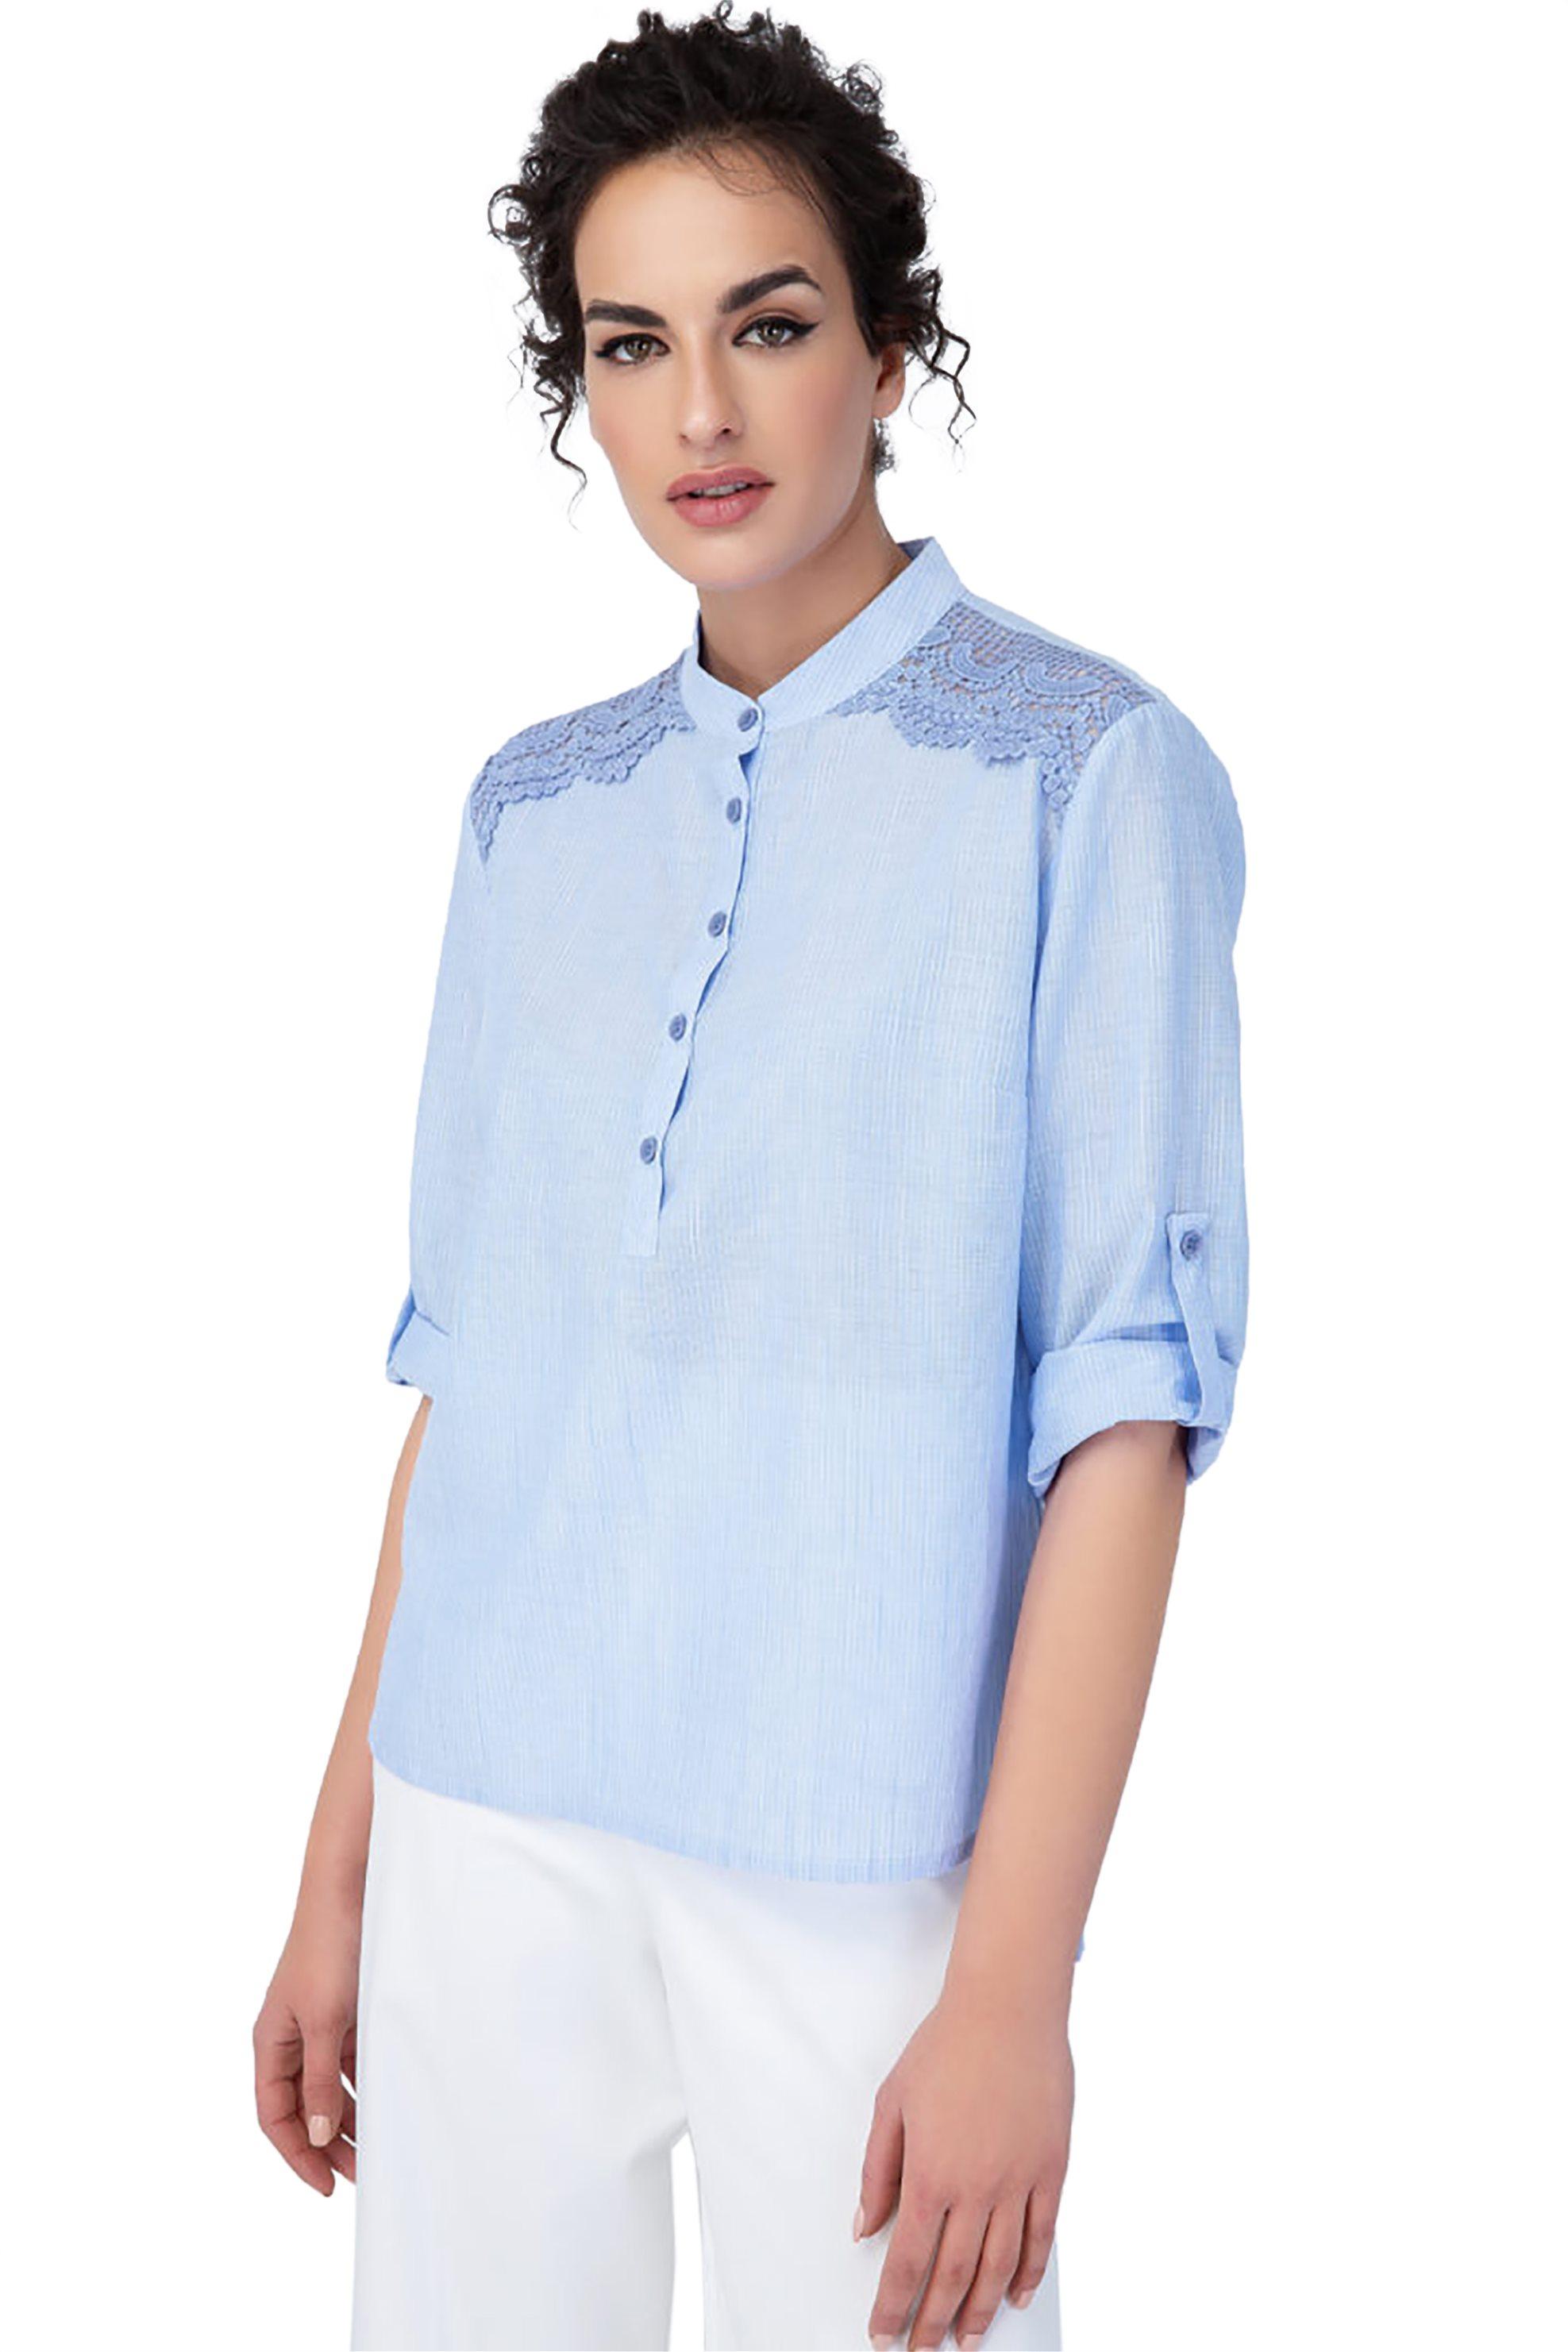 Billy Sabbado γυναικεία μπλούζα με δαντέλα στους ώμους - 0235584112 - Γαλάζιο γυναικα   ρουχα   tops   μπλούζες   casual